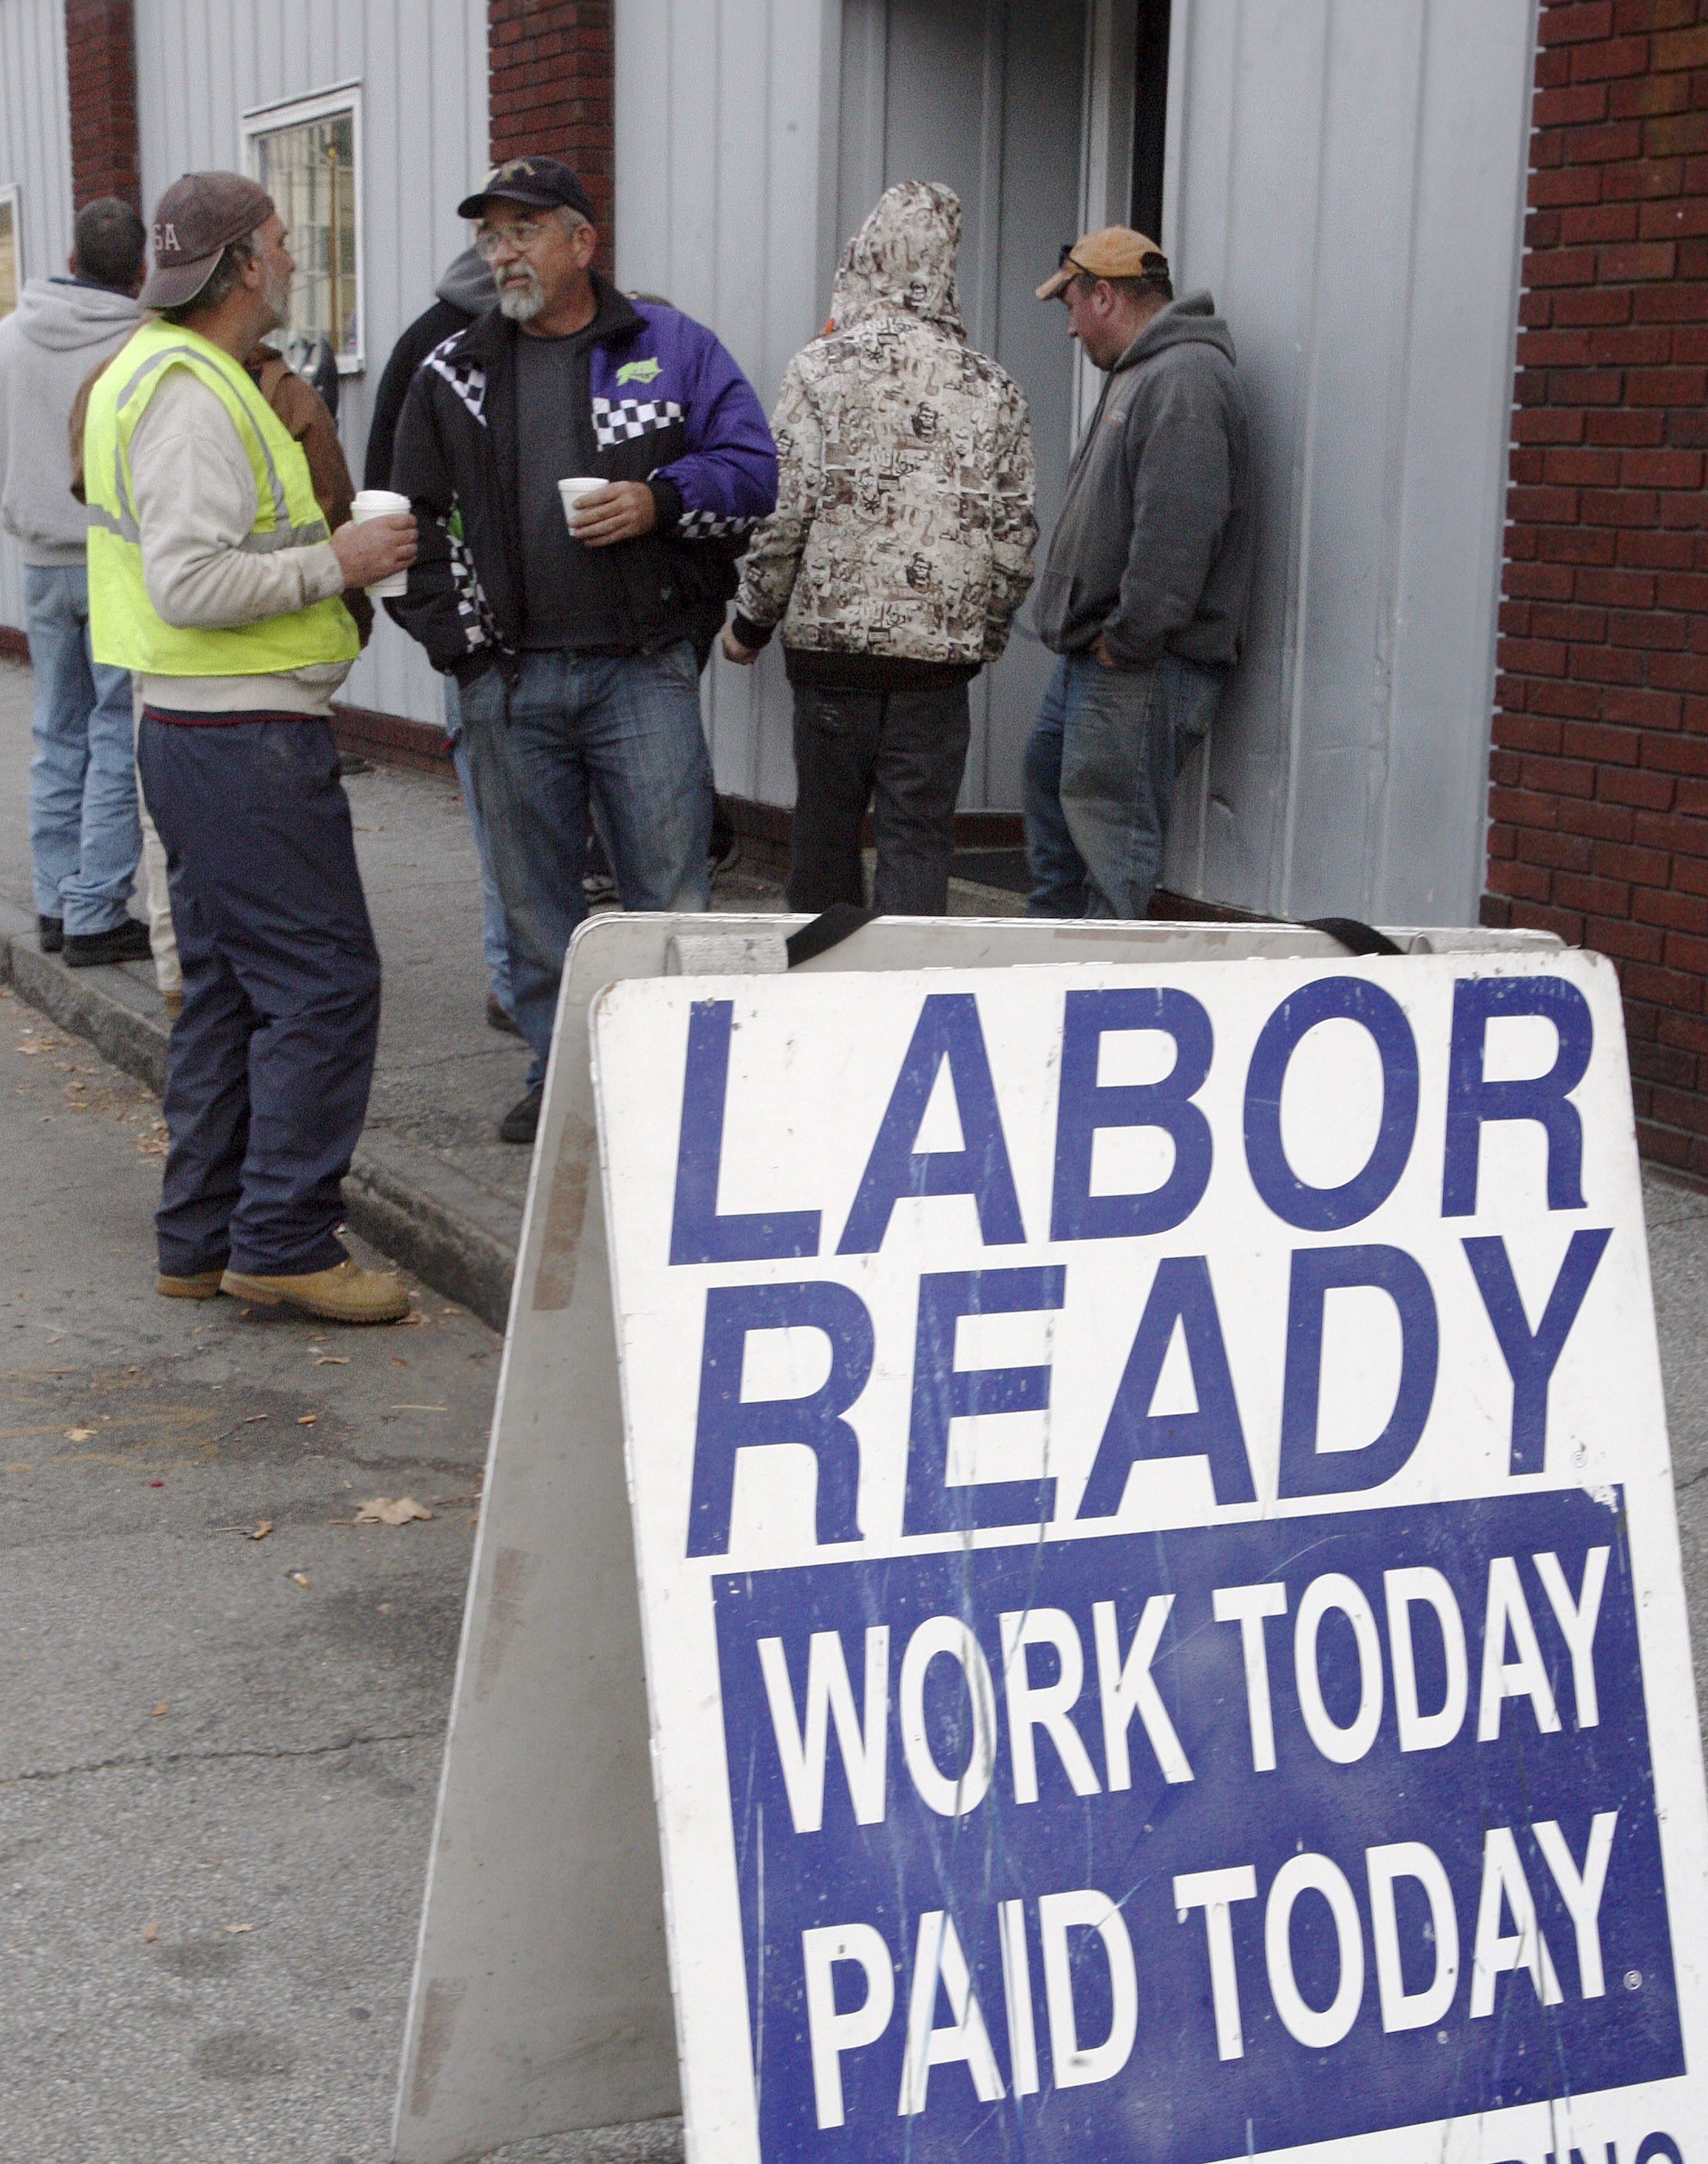 Labor Ready office in Concord, New Hampshire